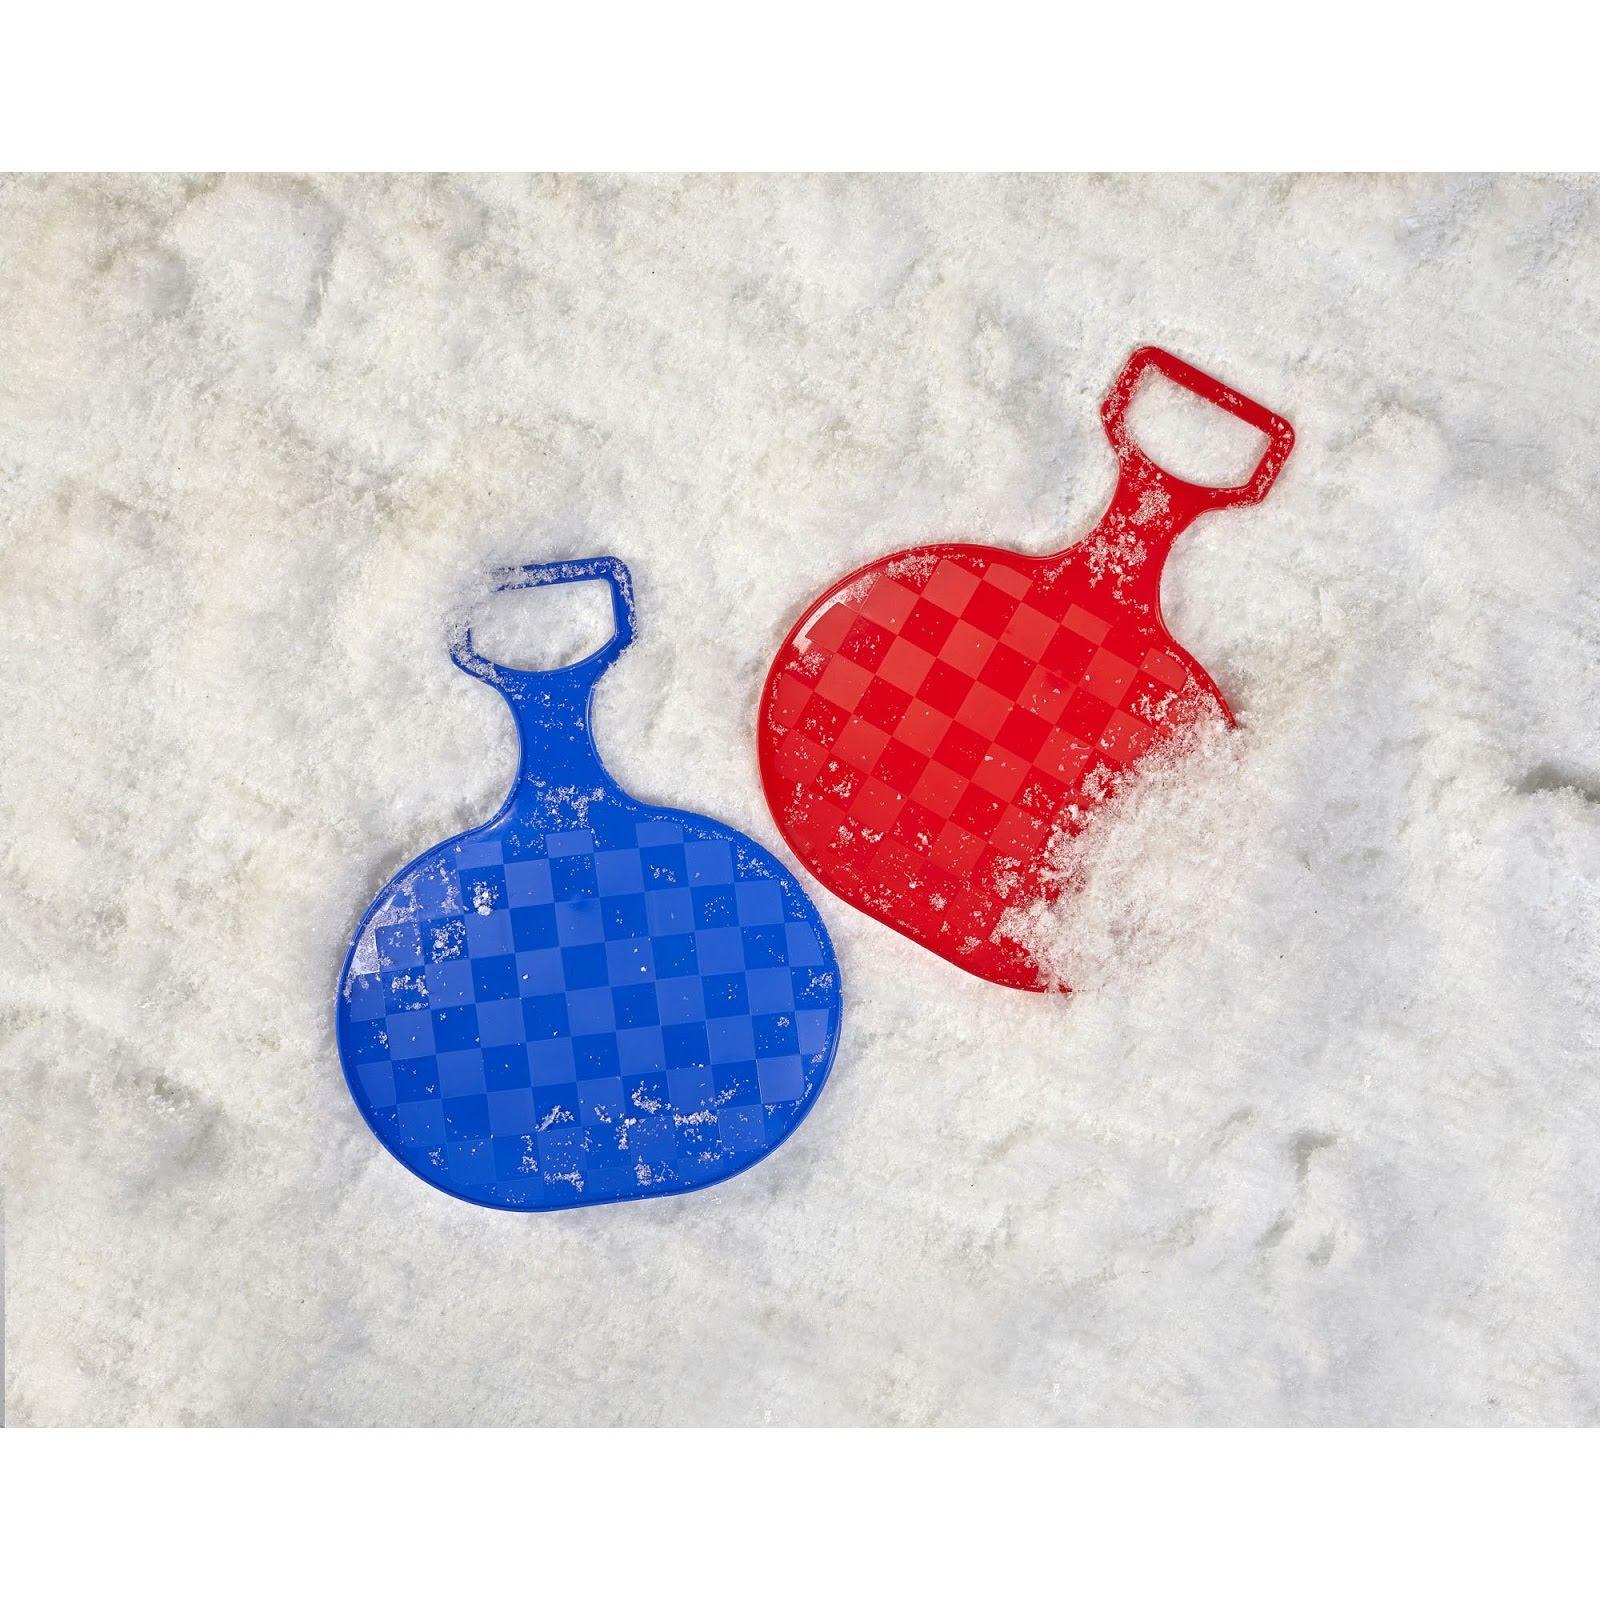 Snow Glider Sledge - Red